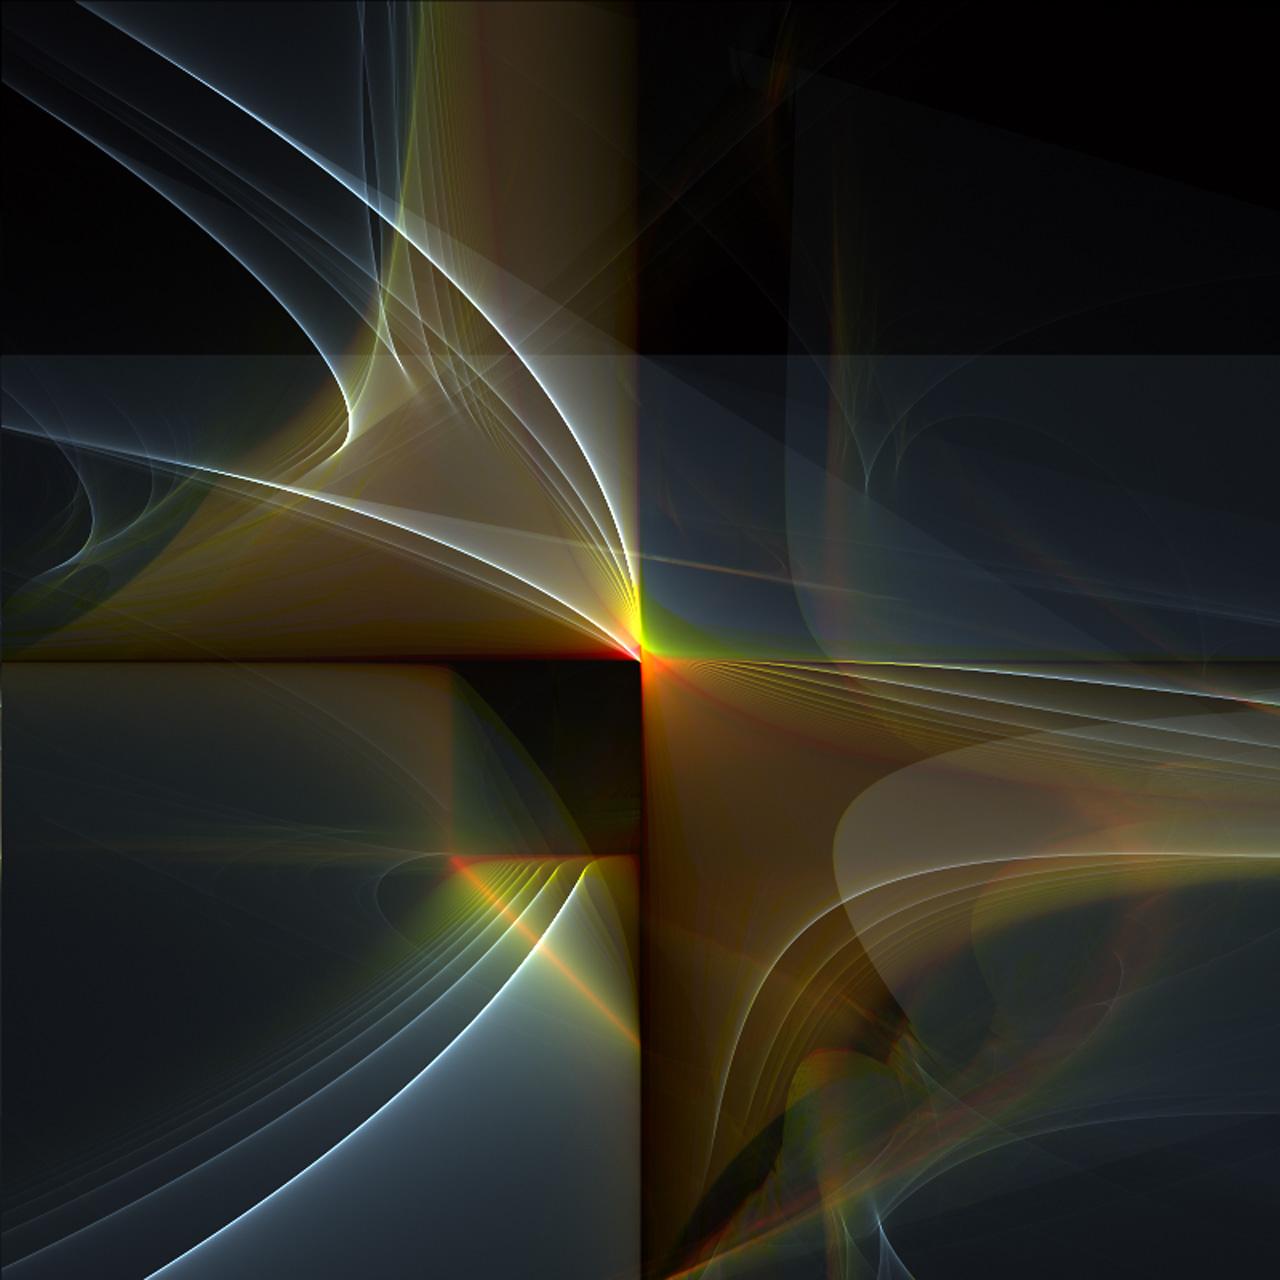 software_buddhabrot_image09